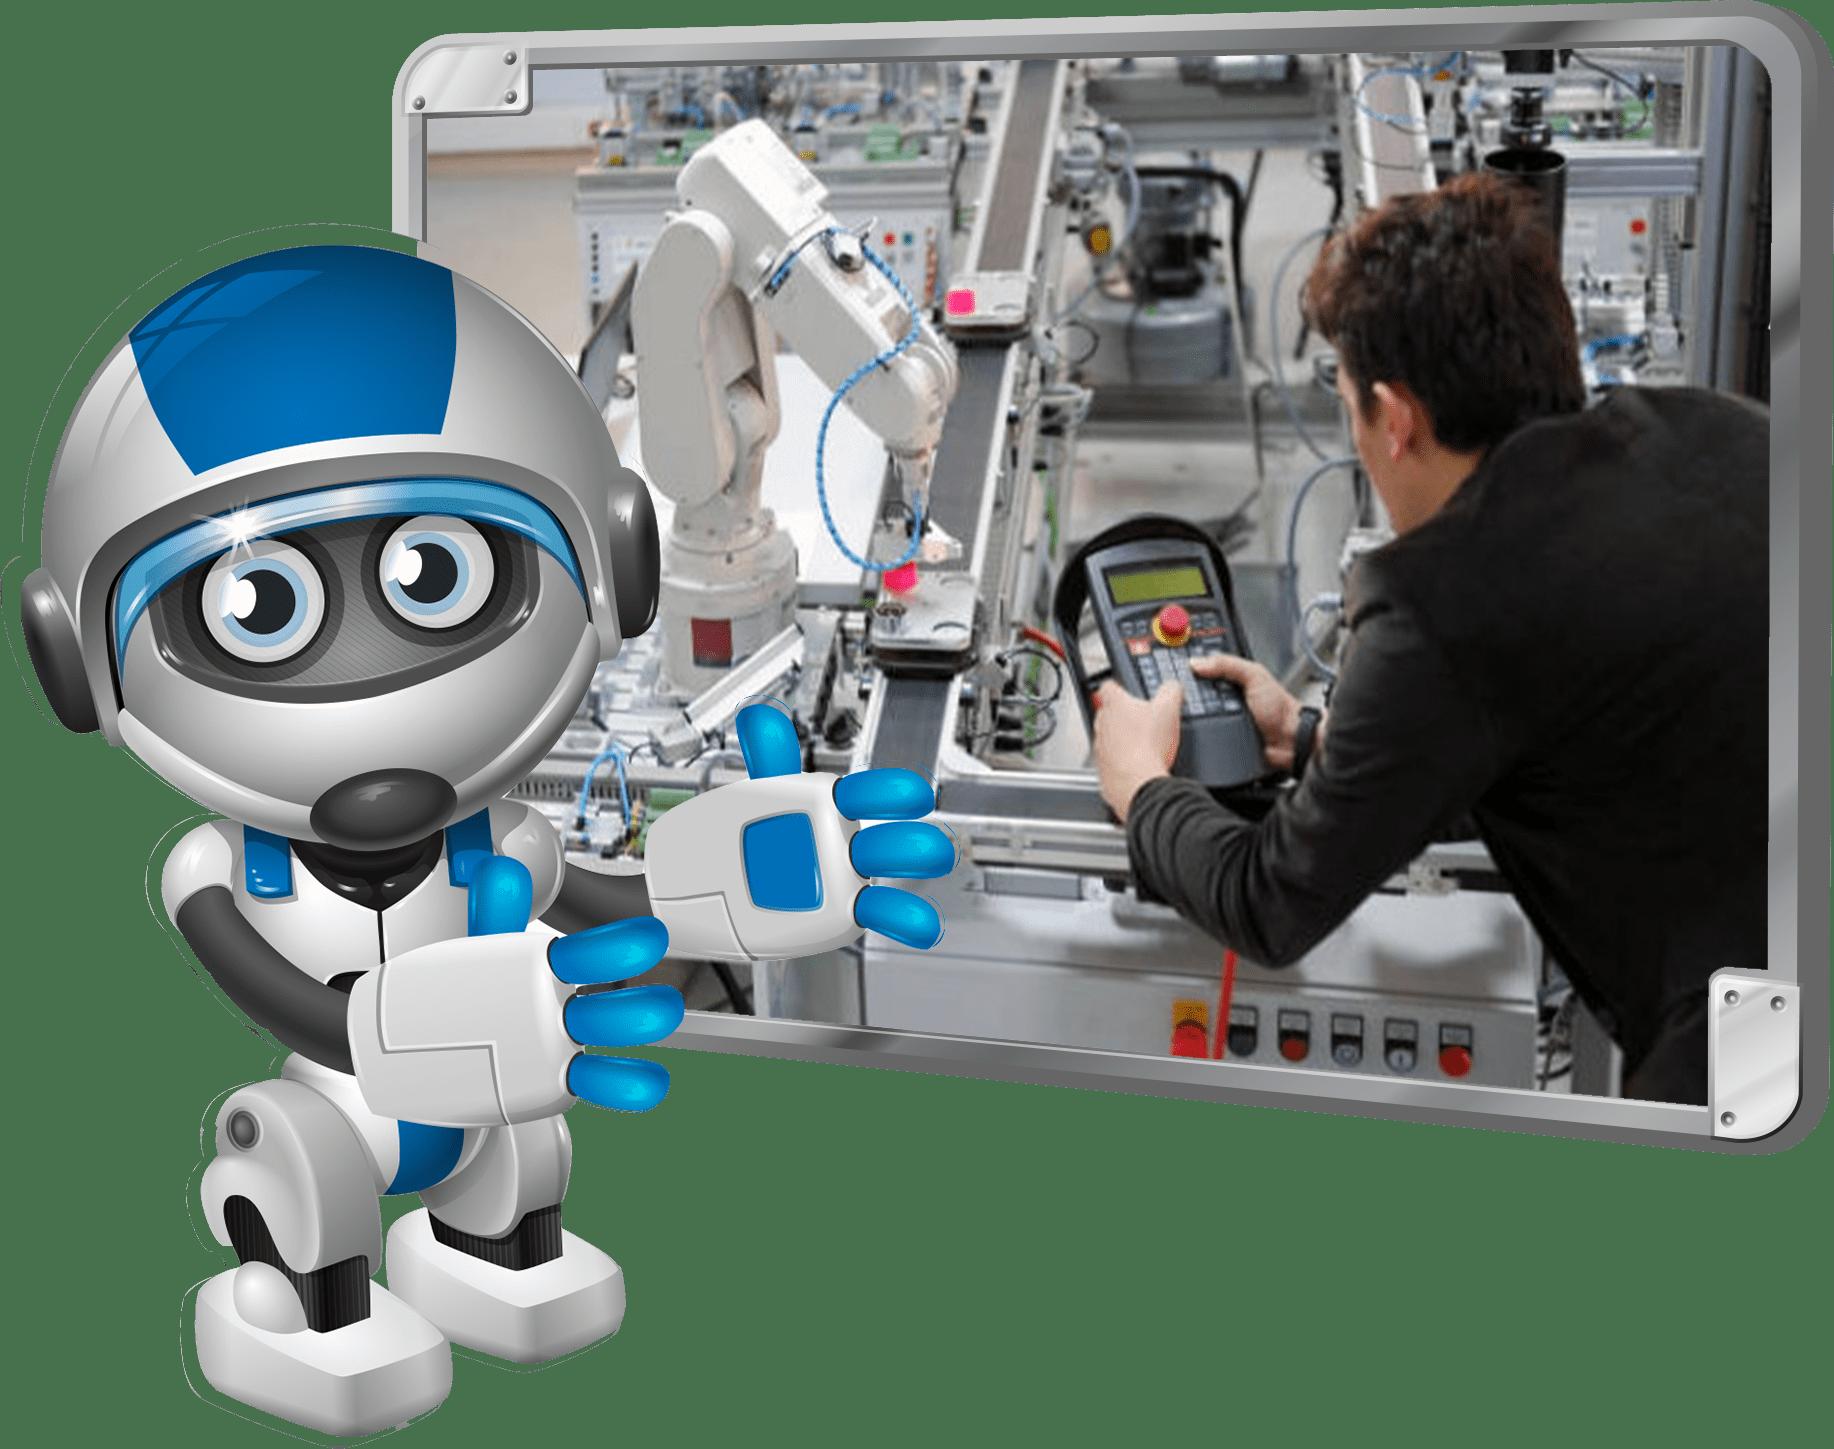 Cheerful Robot 98 minimi - Cursos de Robótica